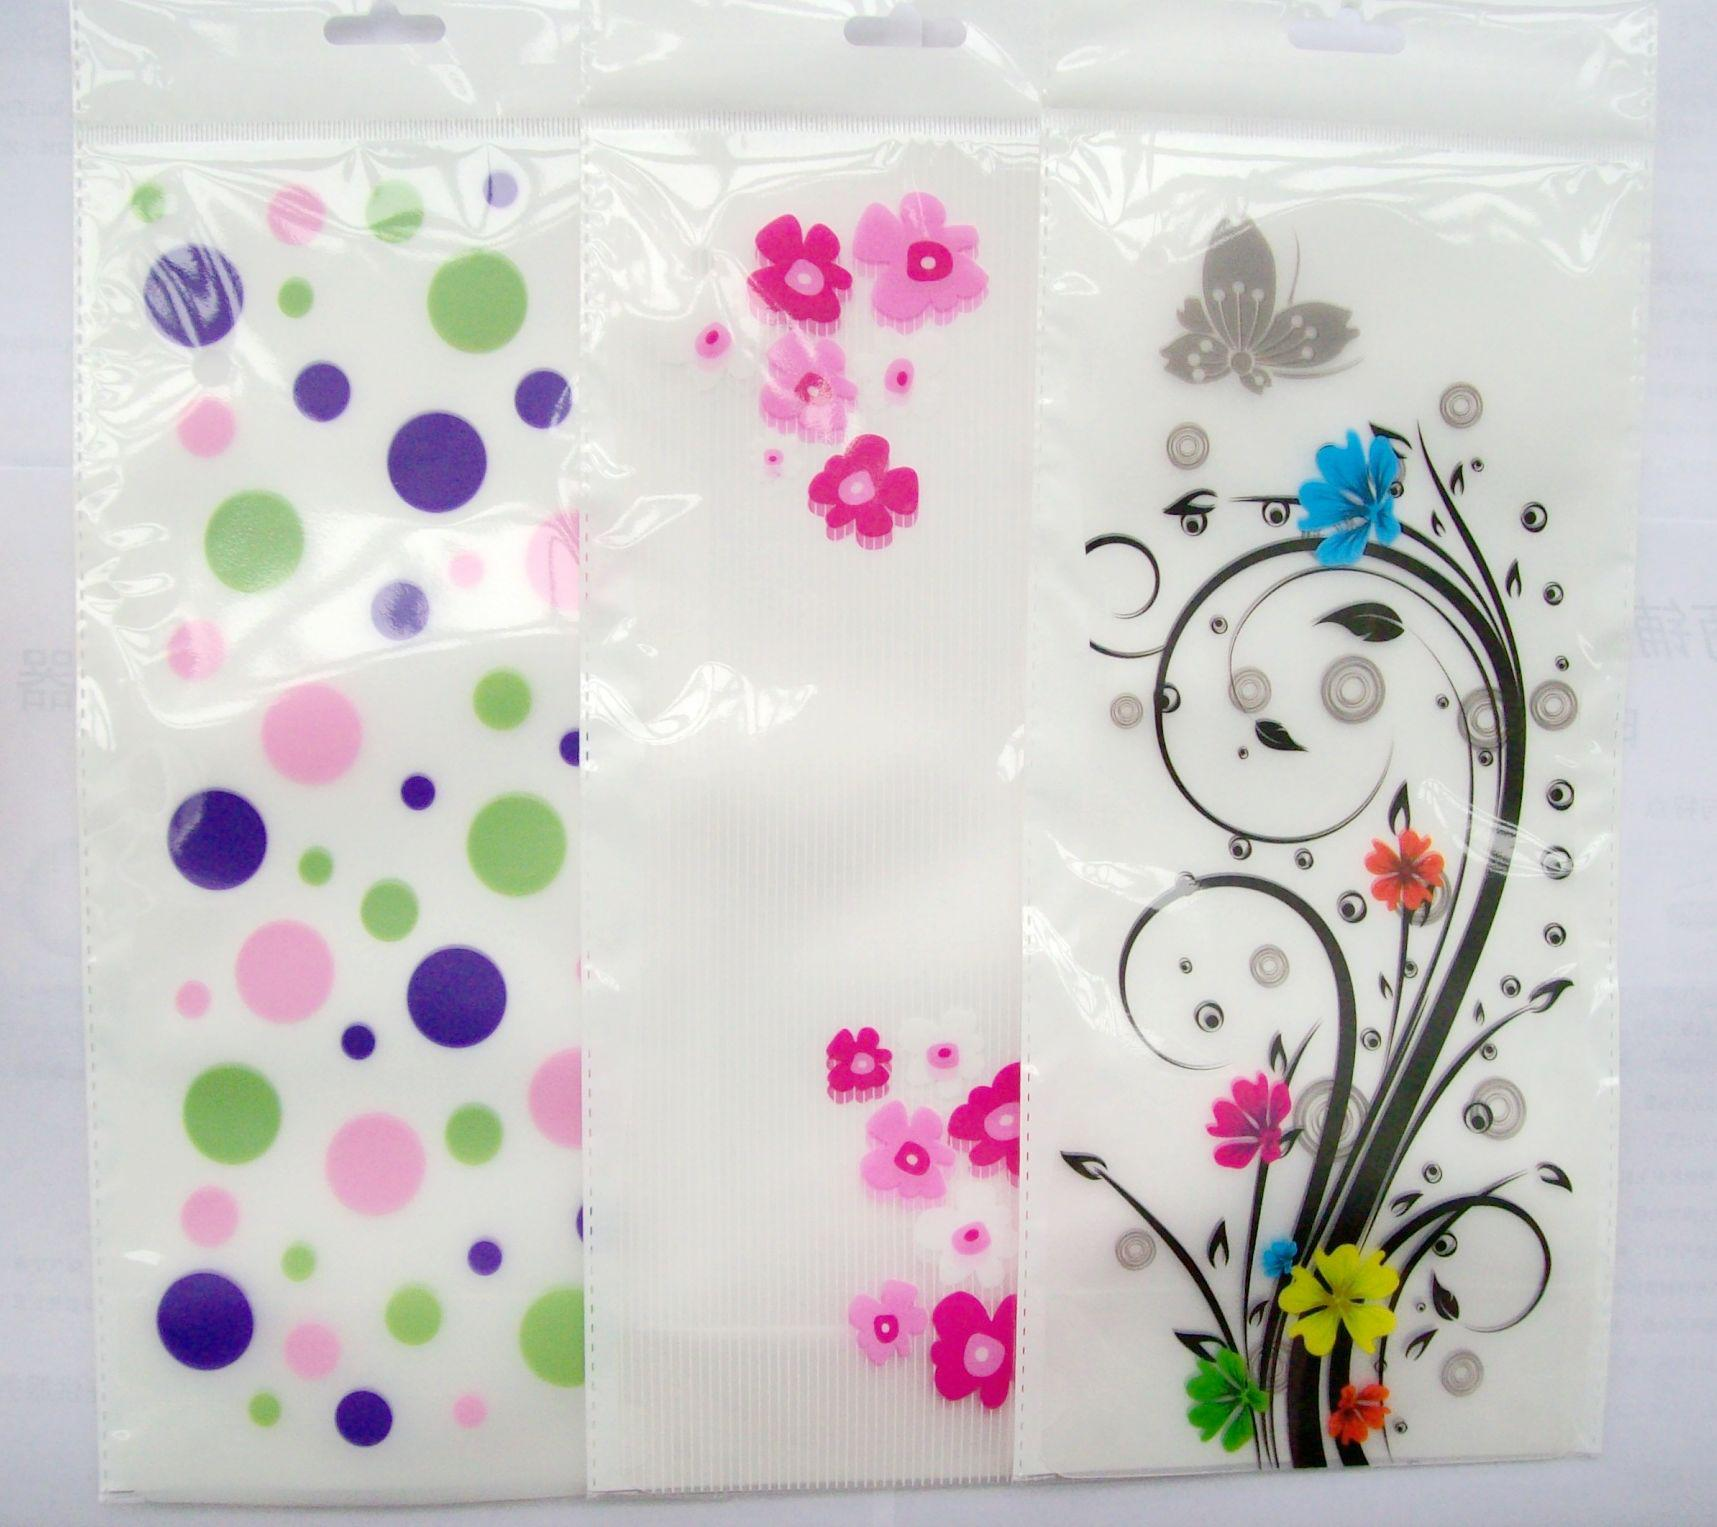 Magic Vouwen Opvouwbare Clear Plastic PVC Bloem Vaas Vouwen Vaas Kleine Plastic Vaas Bruiloft Thuis Tafel Decoraties Mix Stijlen 50 stks / partij